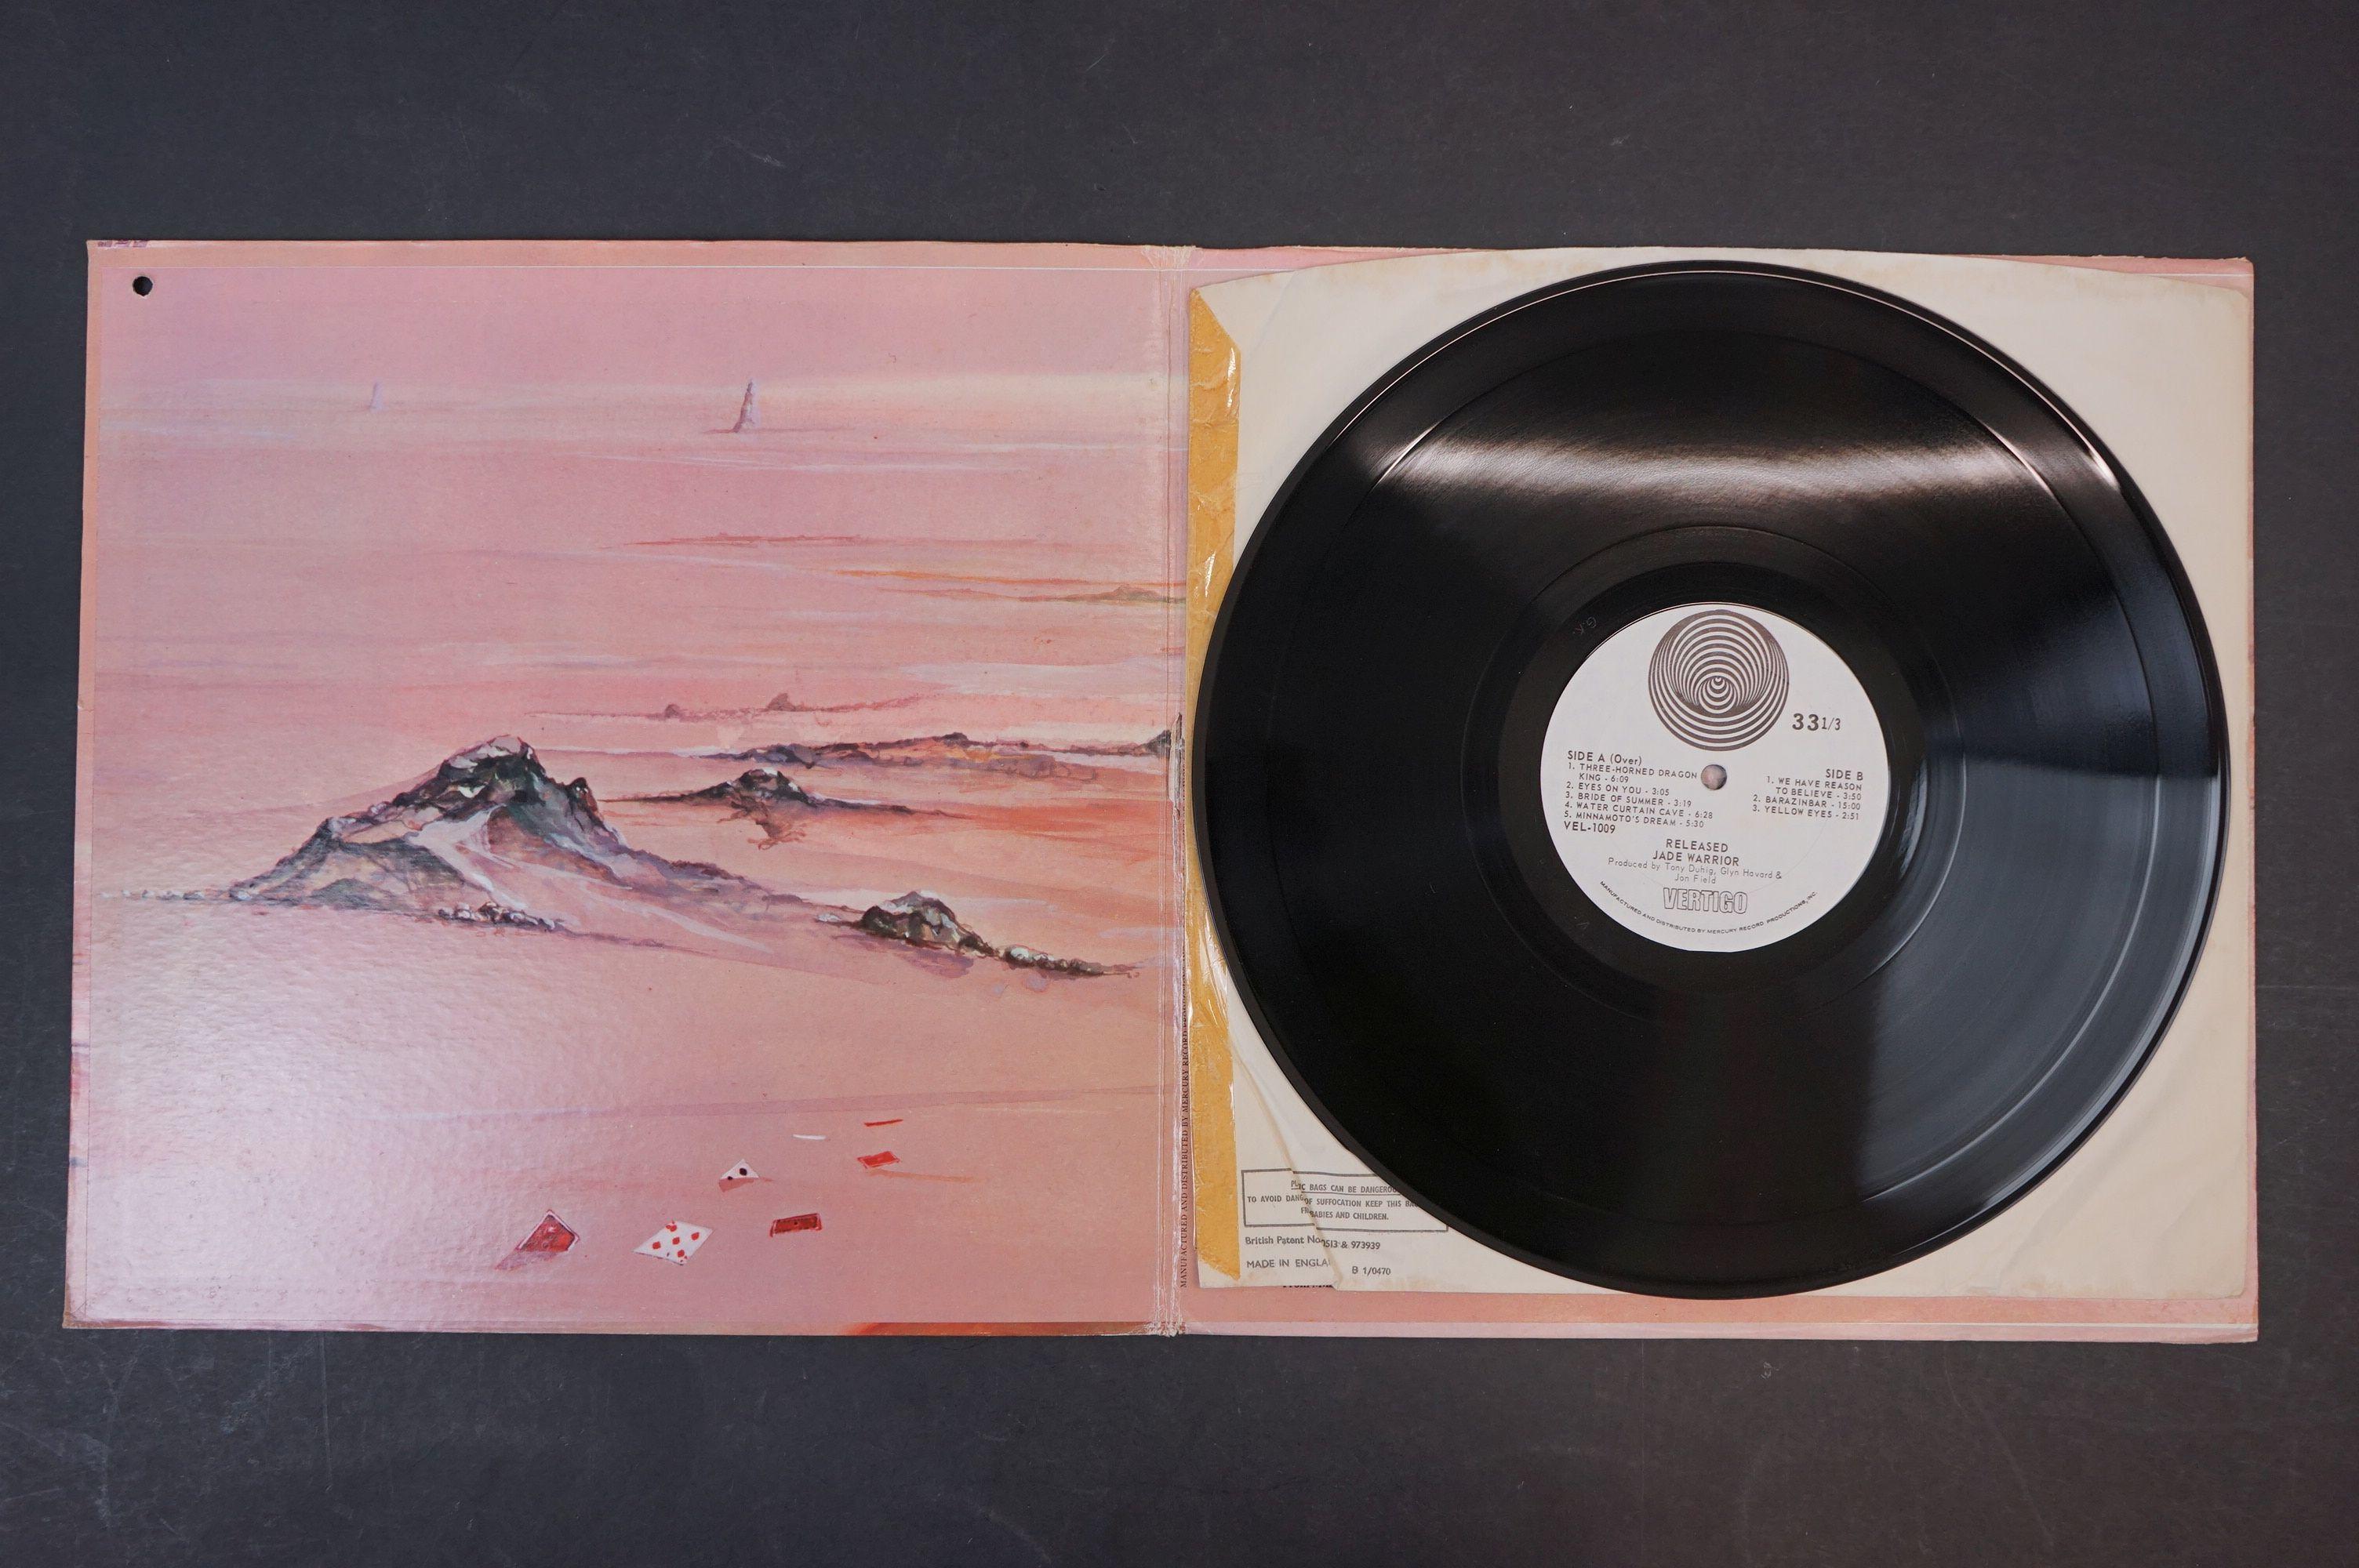 Vinyl - Four Jade Warrior LPs to include Last Autumn Dream LP on Vertigo Deluxe 6360079 gatefold - Image 5 of 9